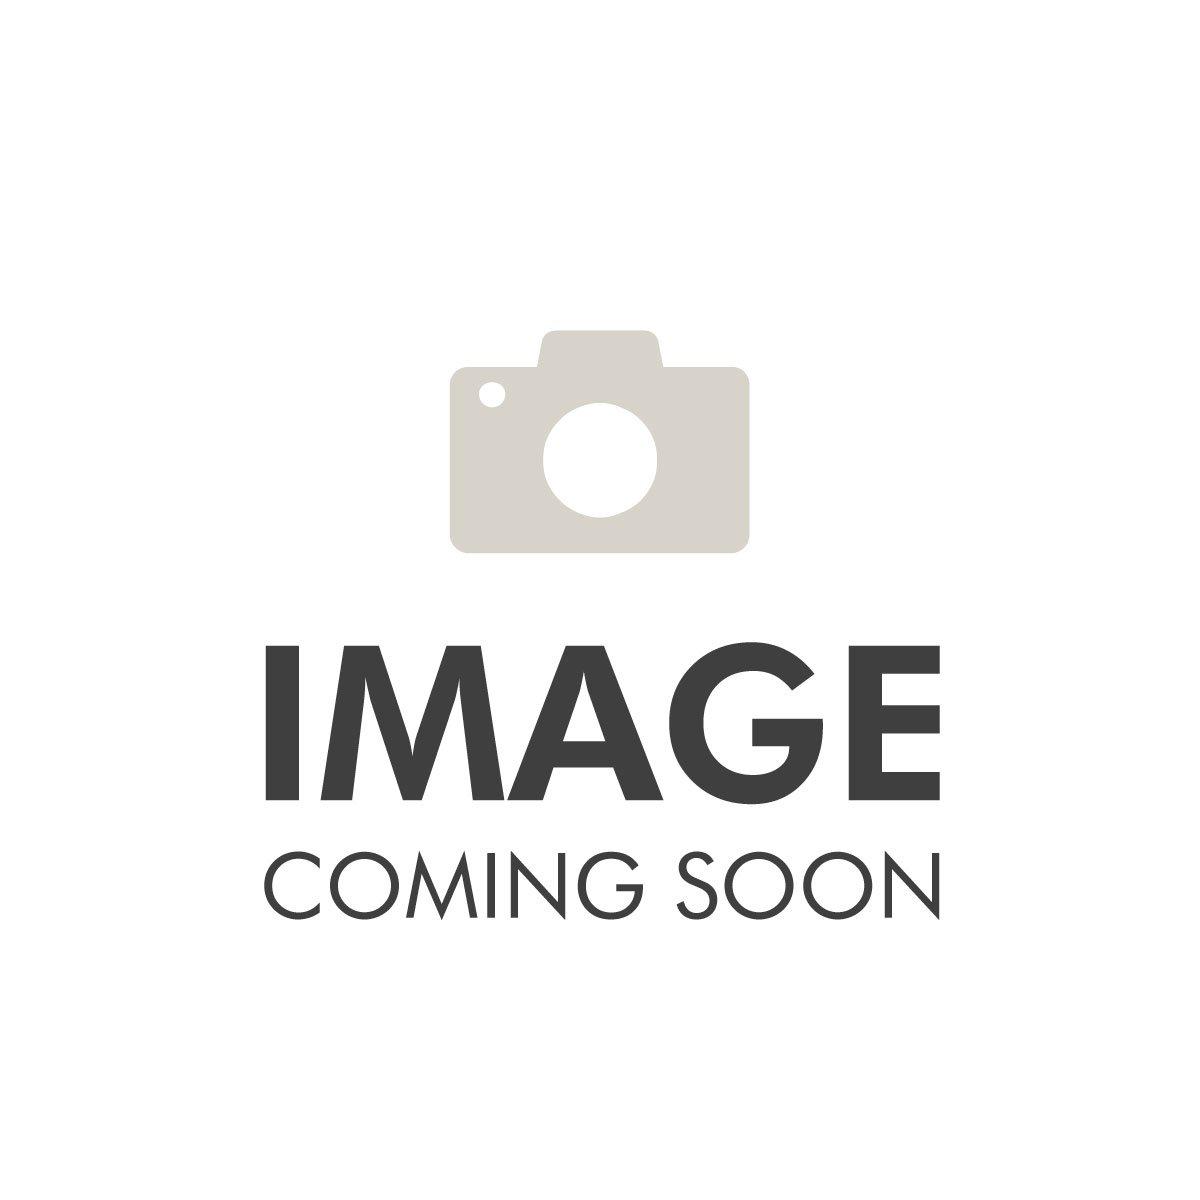 Clarins Ever Matte Mineral Powder Compact 02 Transparent Medium